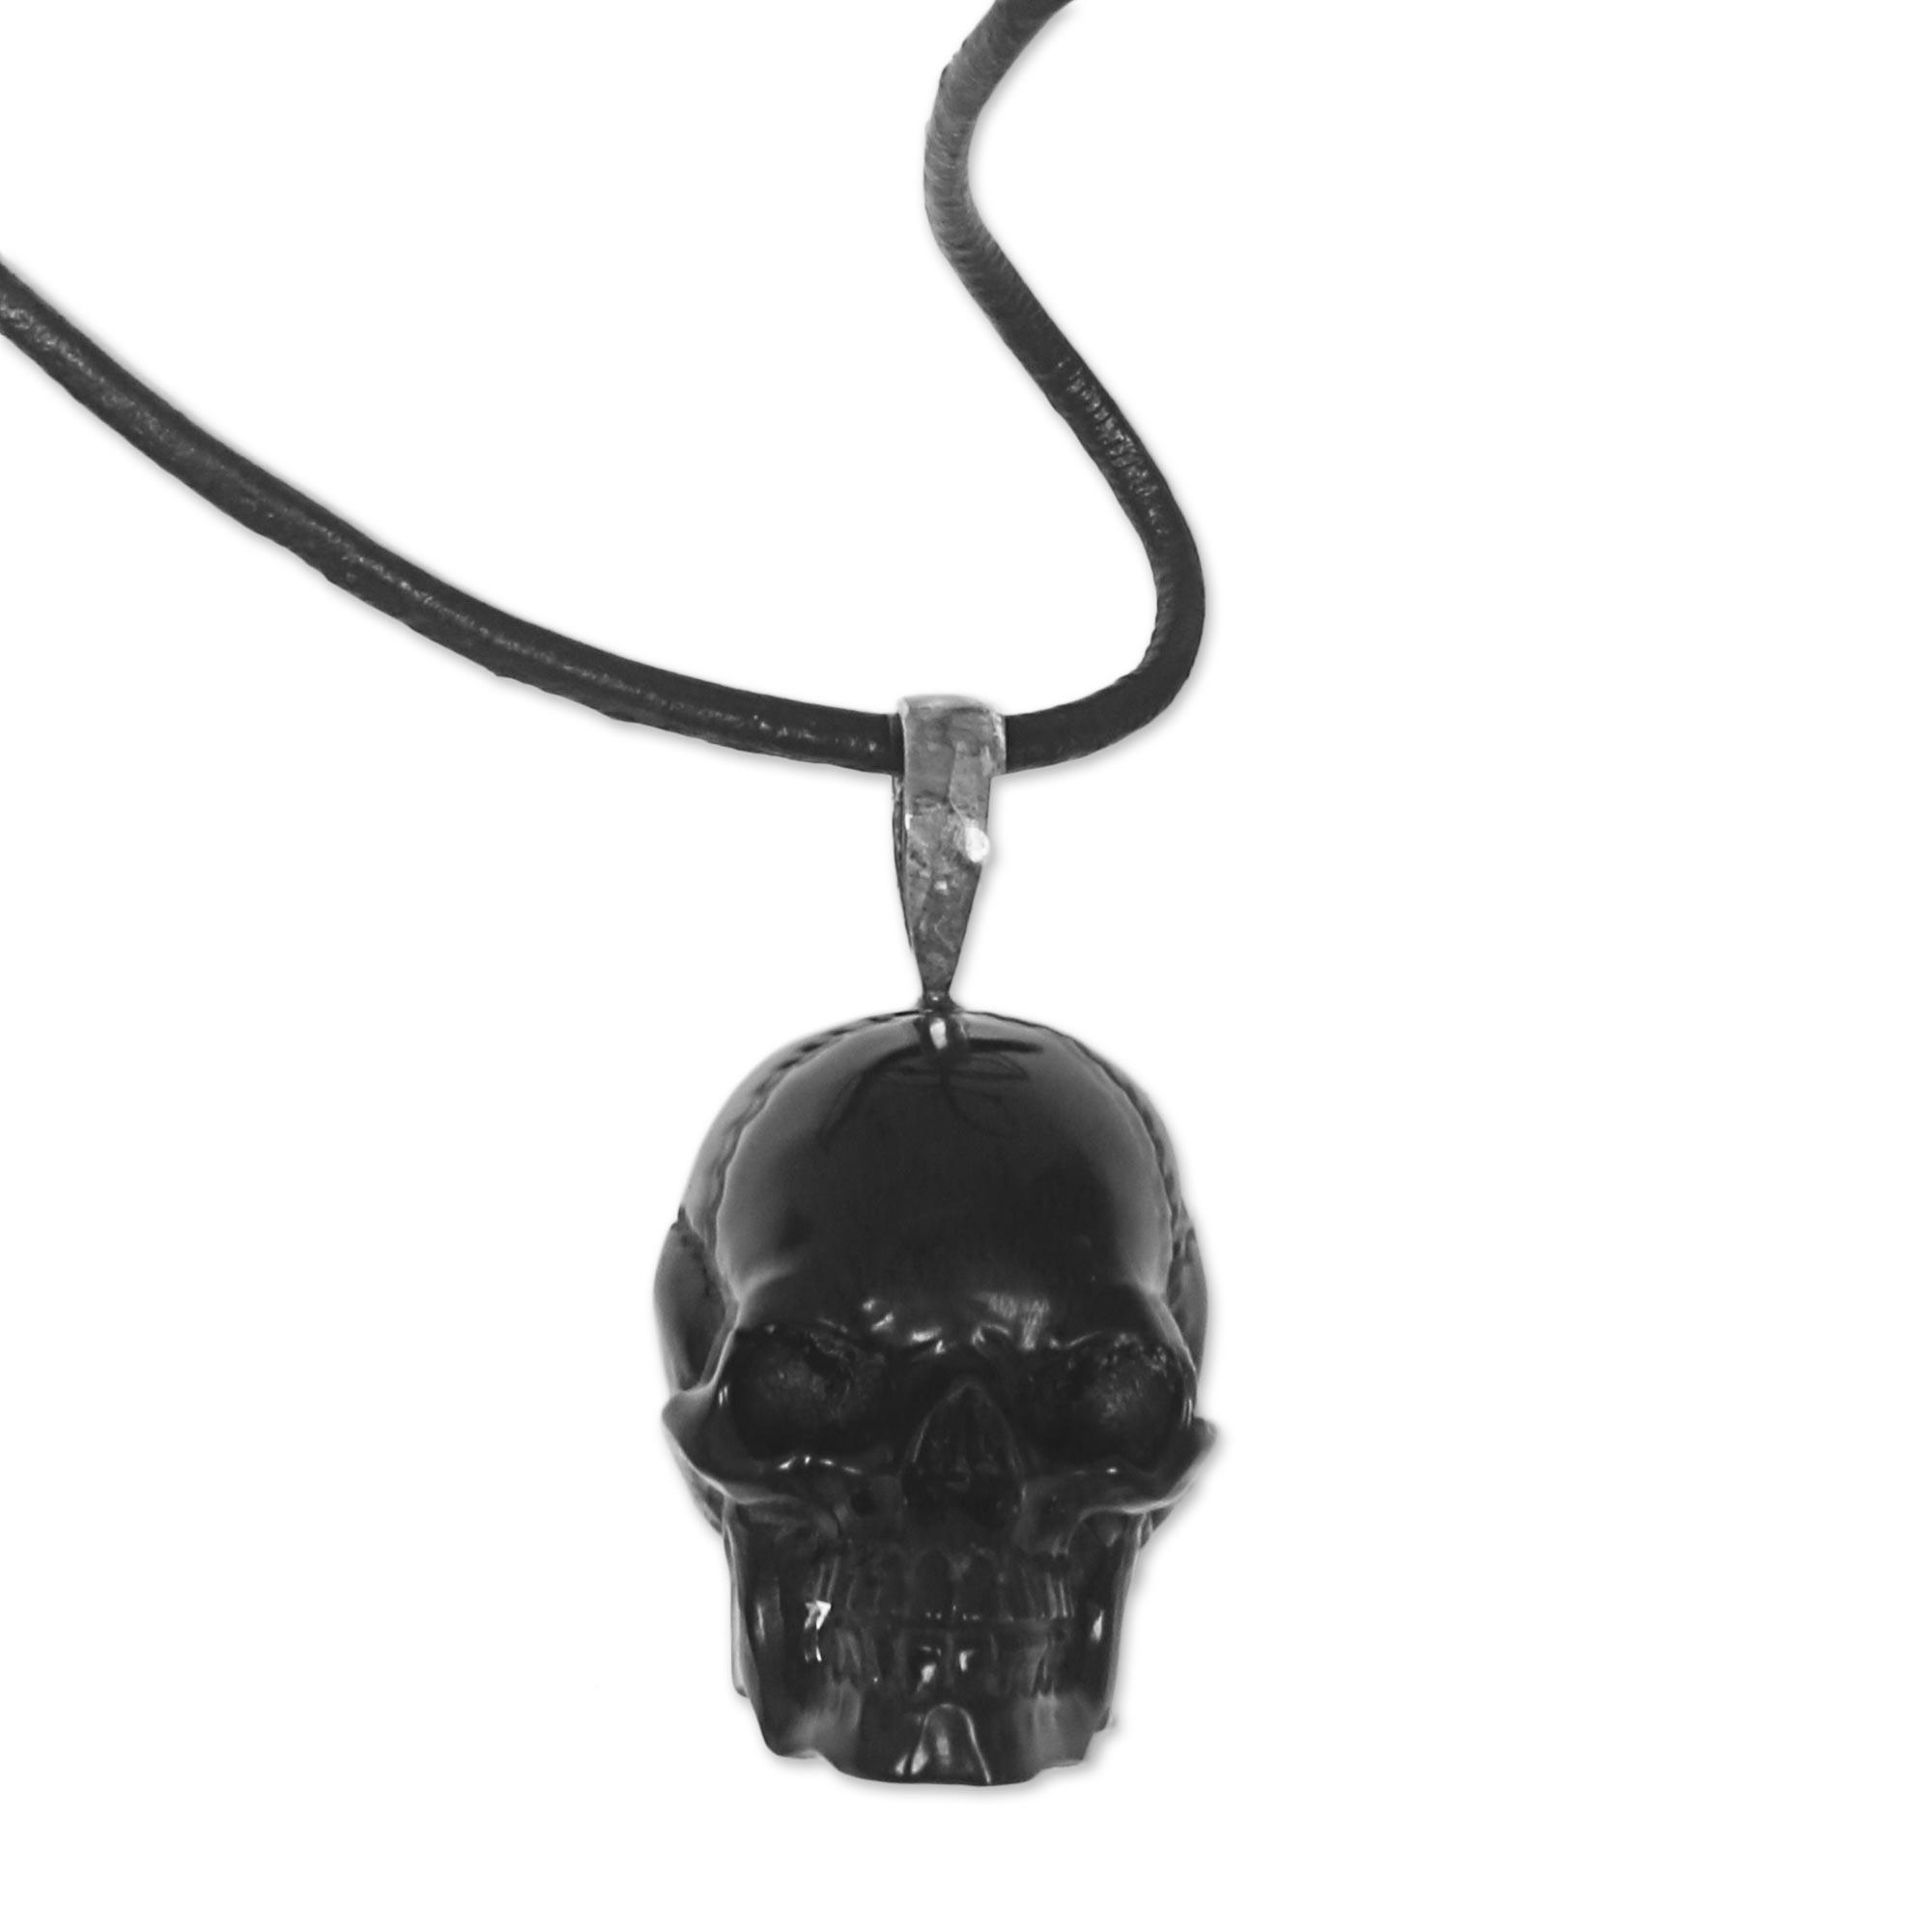 Kiva Store Carved Bone Skull Pendant On Cord Handmade In Indonesia Black Skull